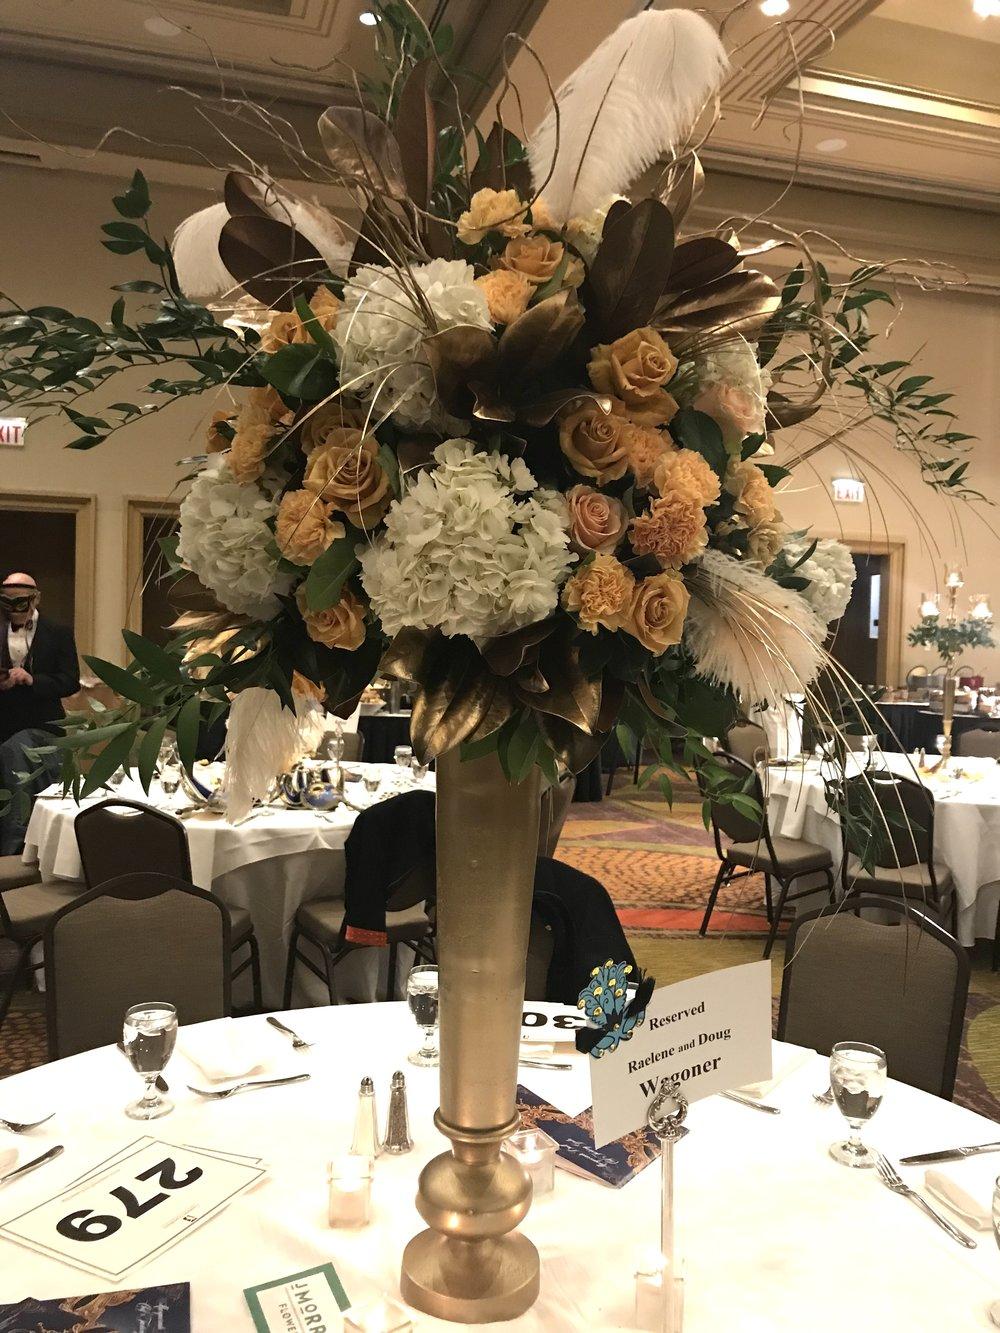 Loudoun-Symphony-Gala-Corporate-Event-Jmorrisflowers.jpeg